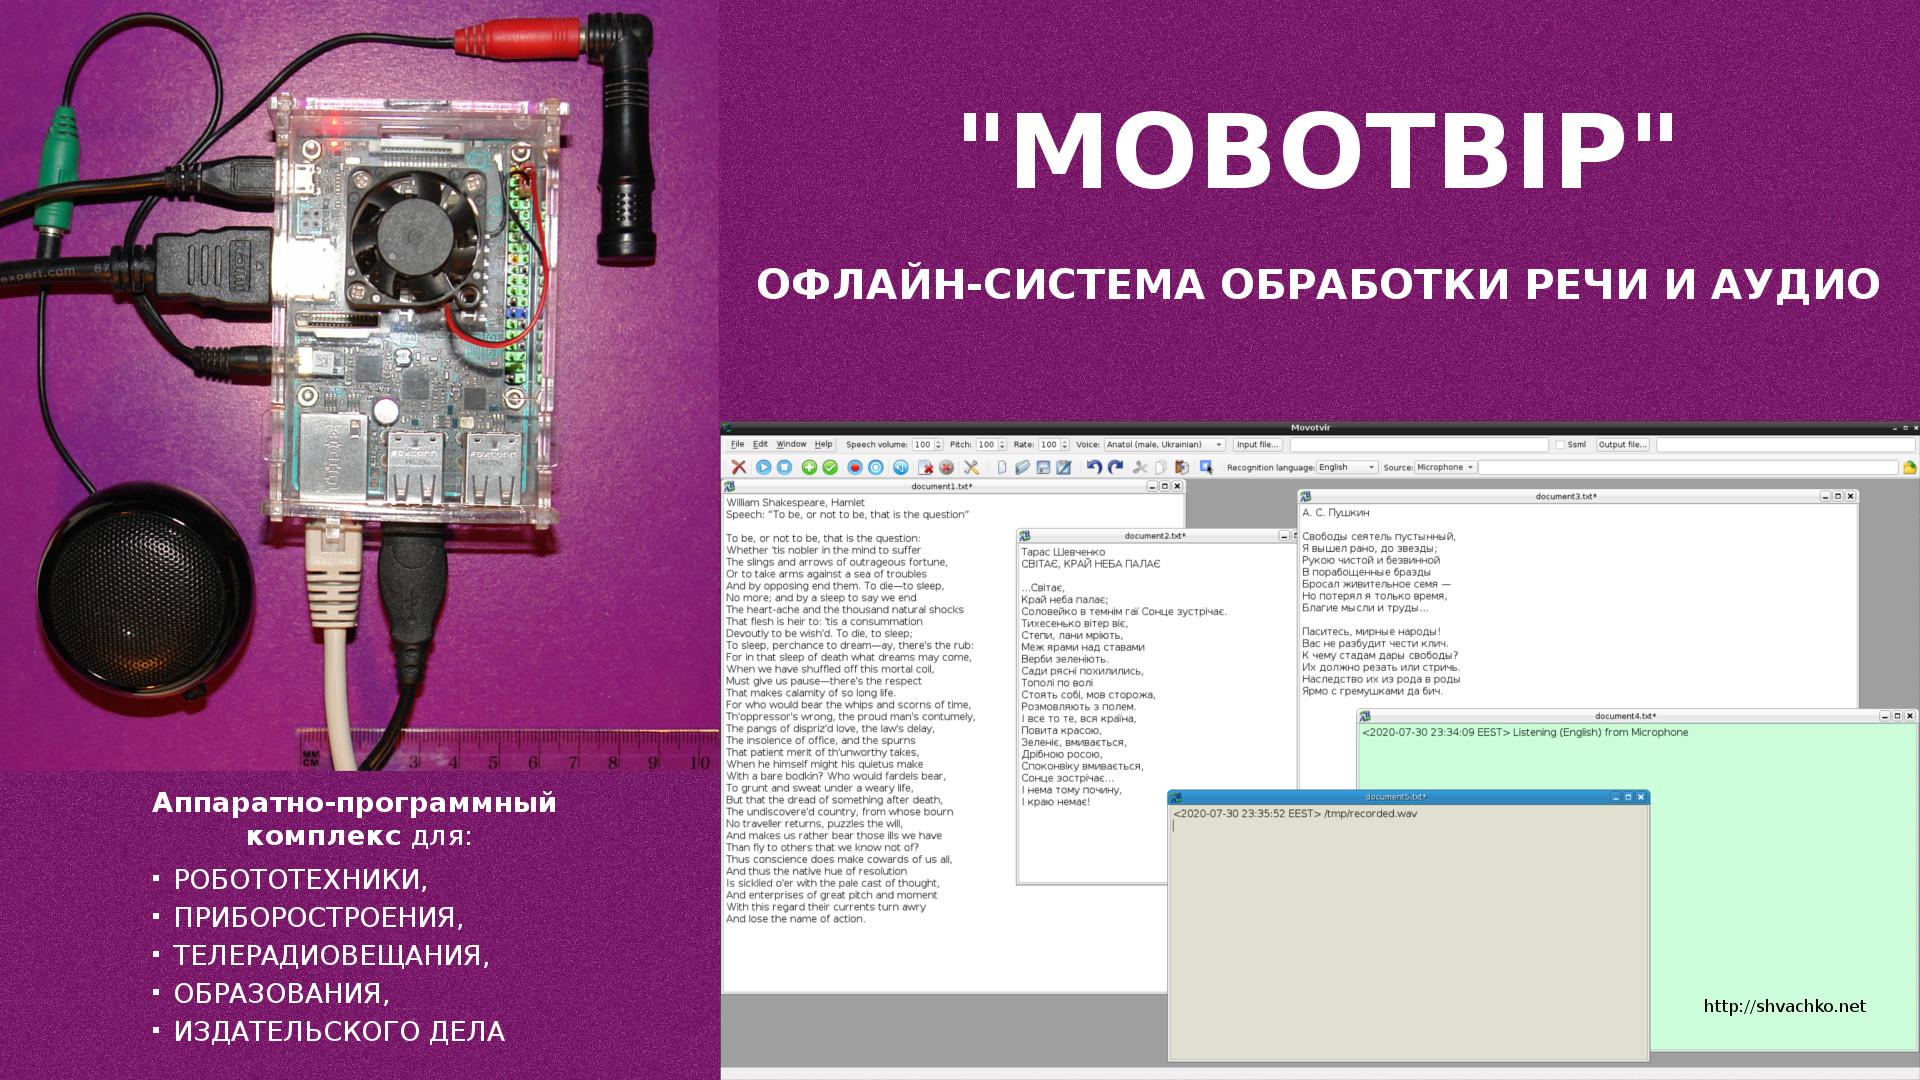 Система обработки речи и аудио _Мовотвір_